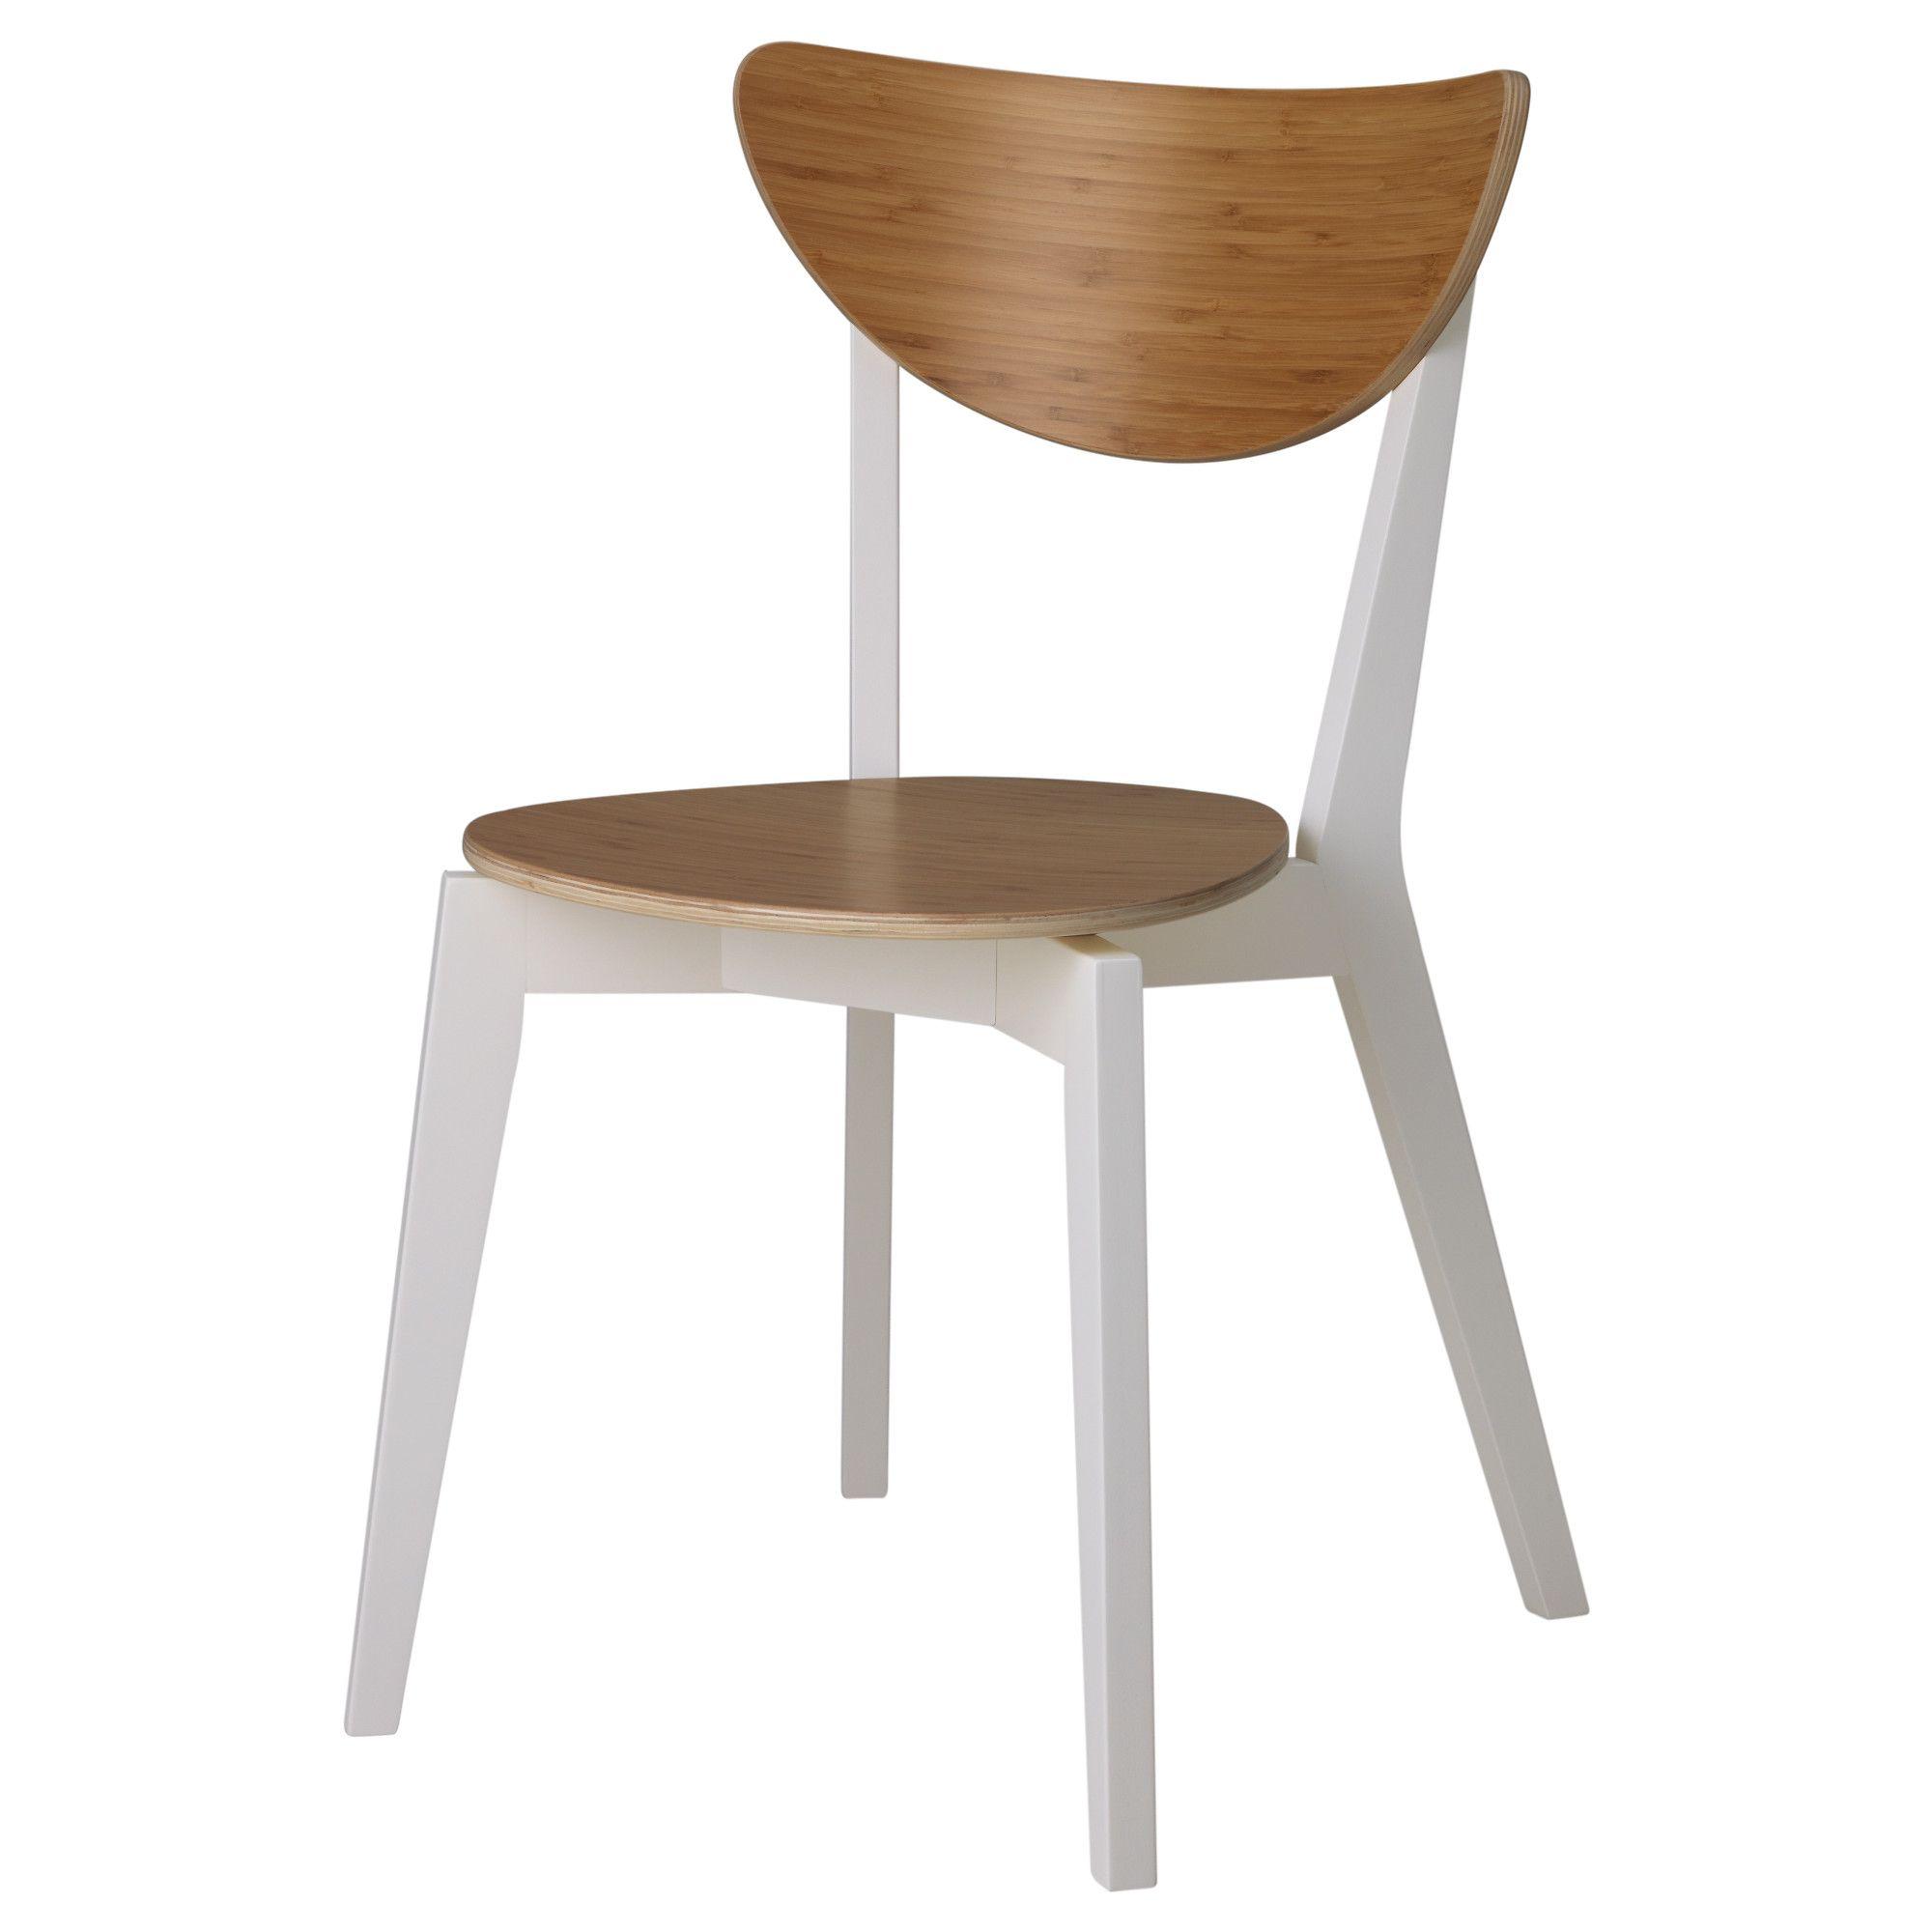 f4d951fb943b66340e120c3ba3535c82 Impressionnant De Table Gigogne Ikea Concept